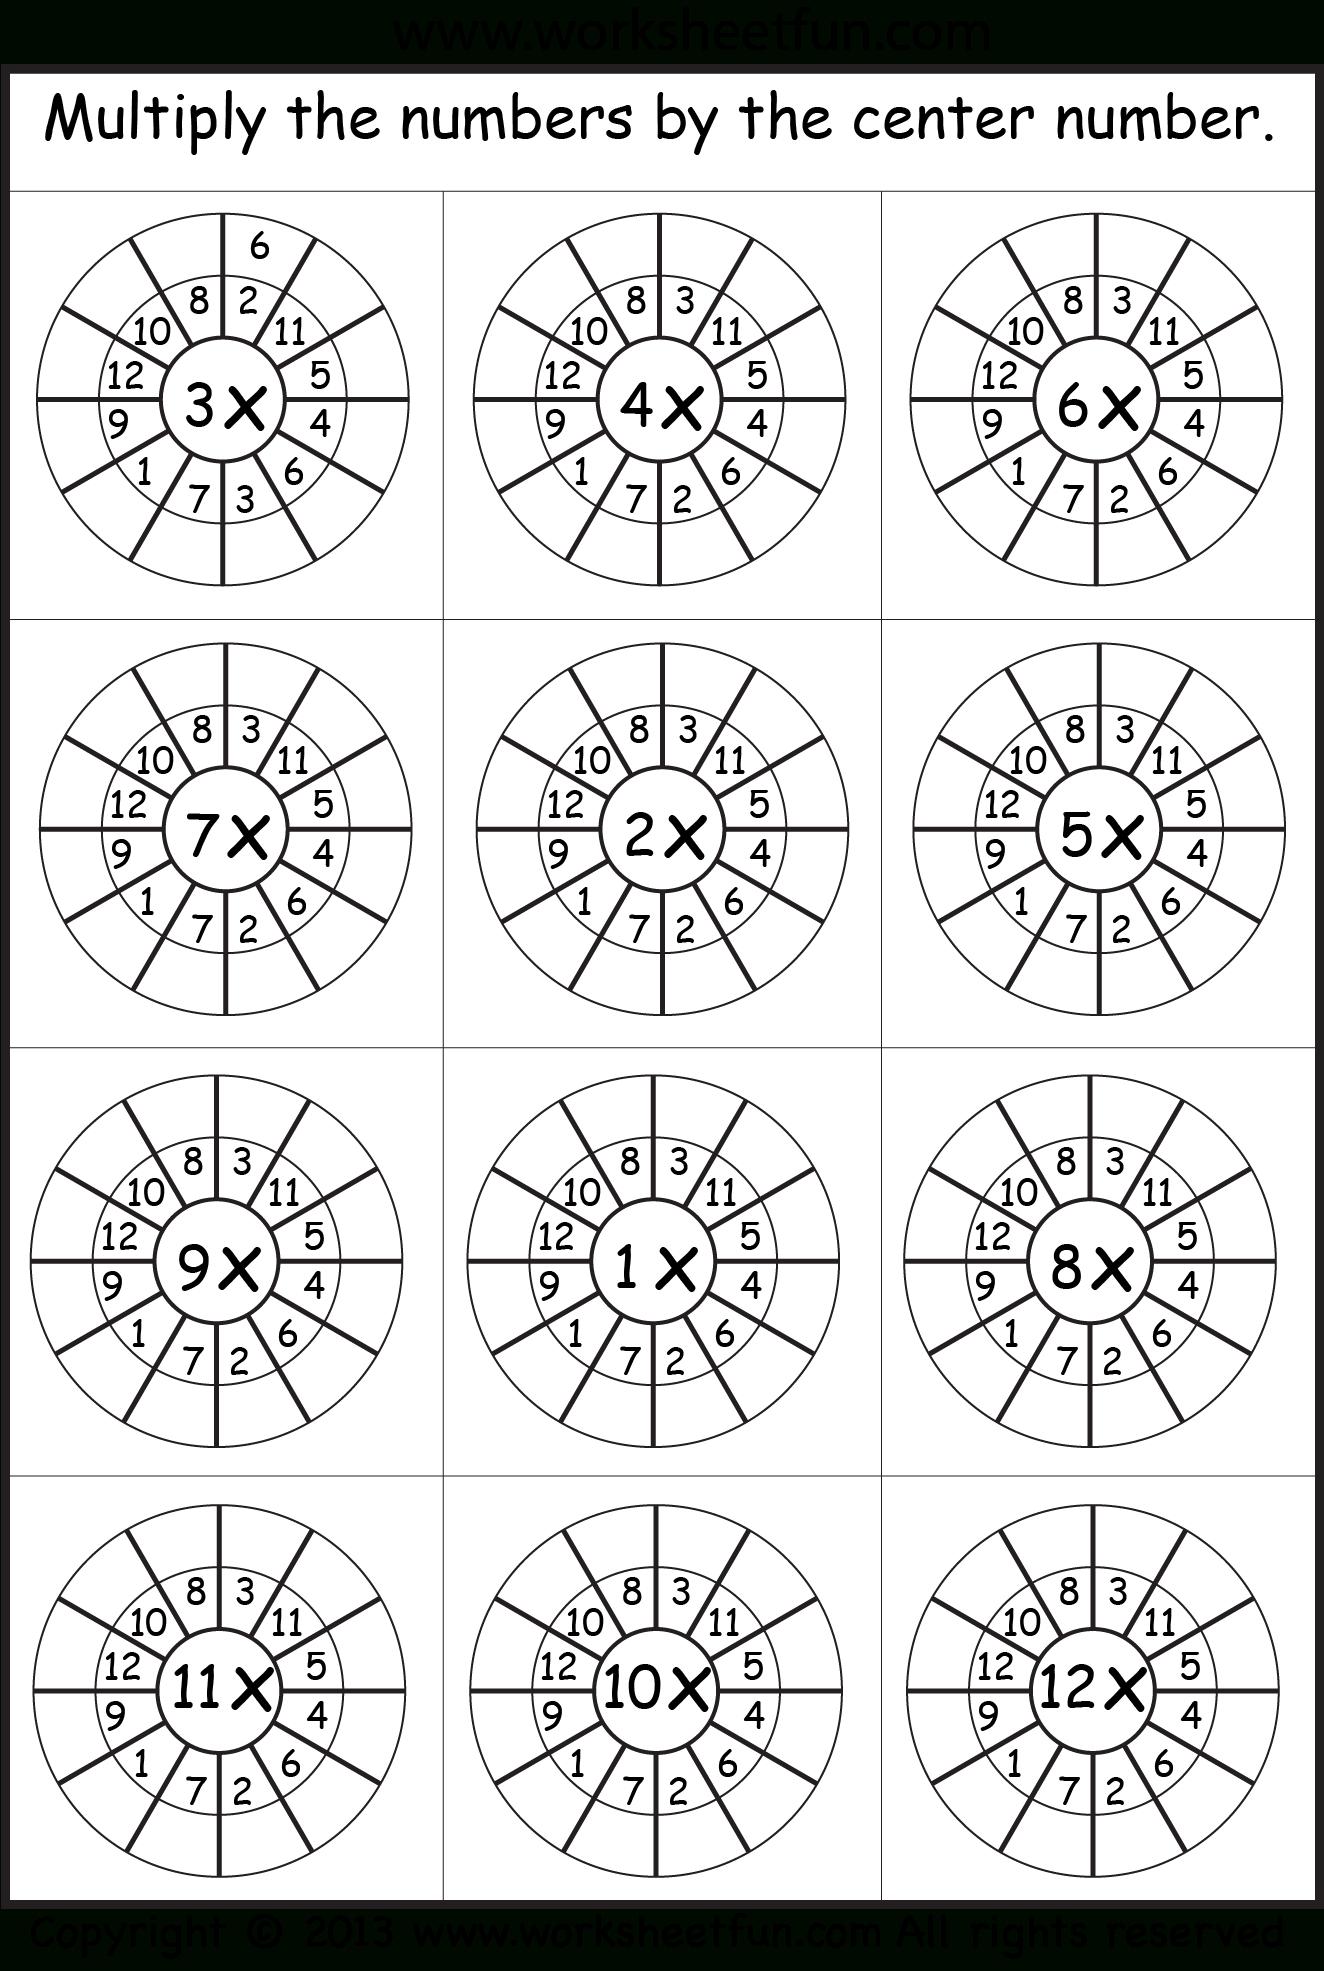 Multiplication Worksheet 8 Times Tables   Printable intended for Multiplication Worksheets Random